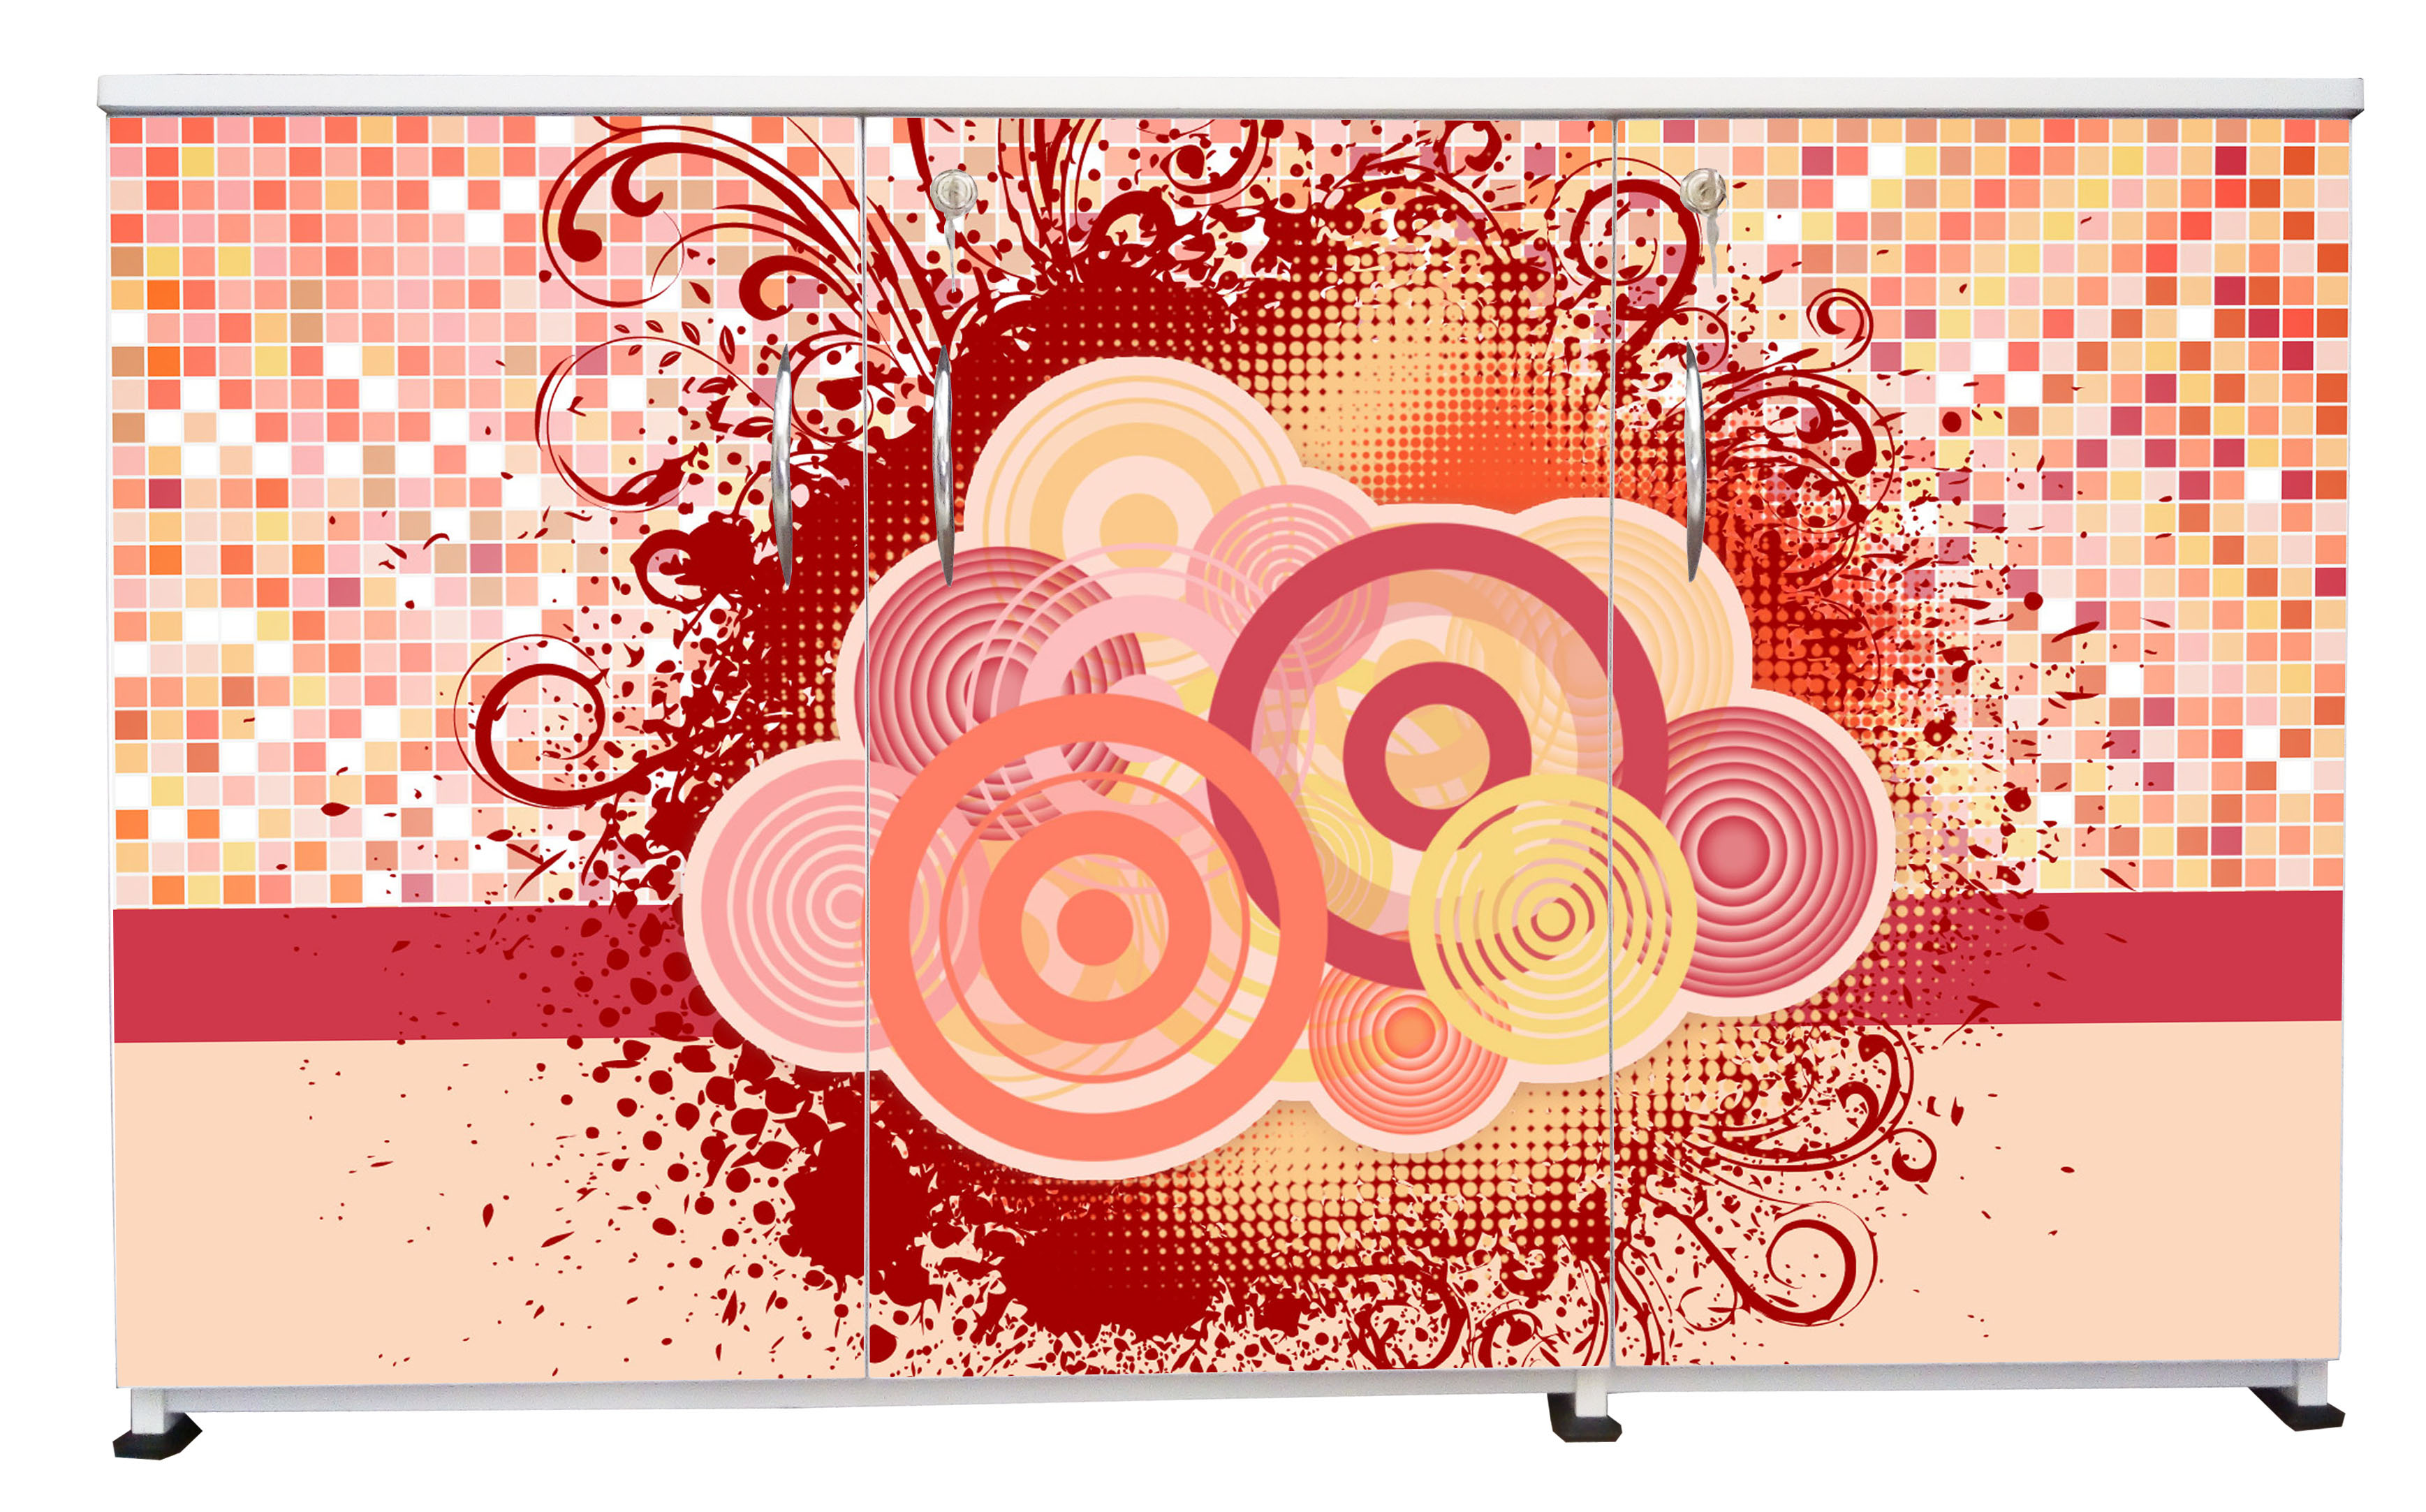 BS-3DS-28 - PinkfulCircles-A